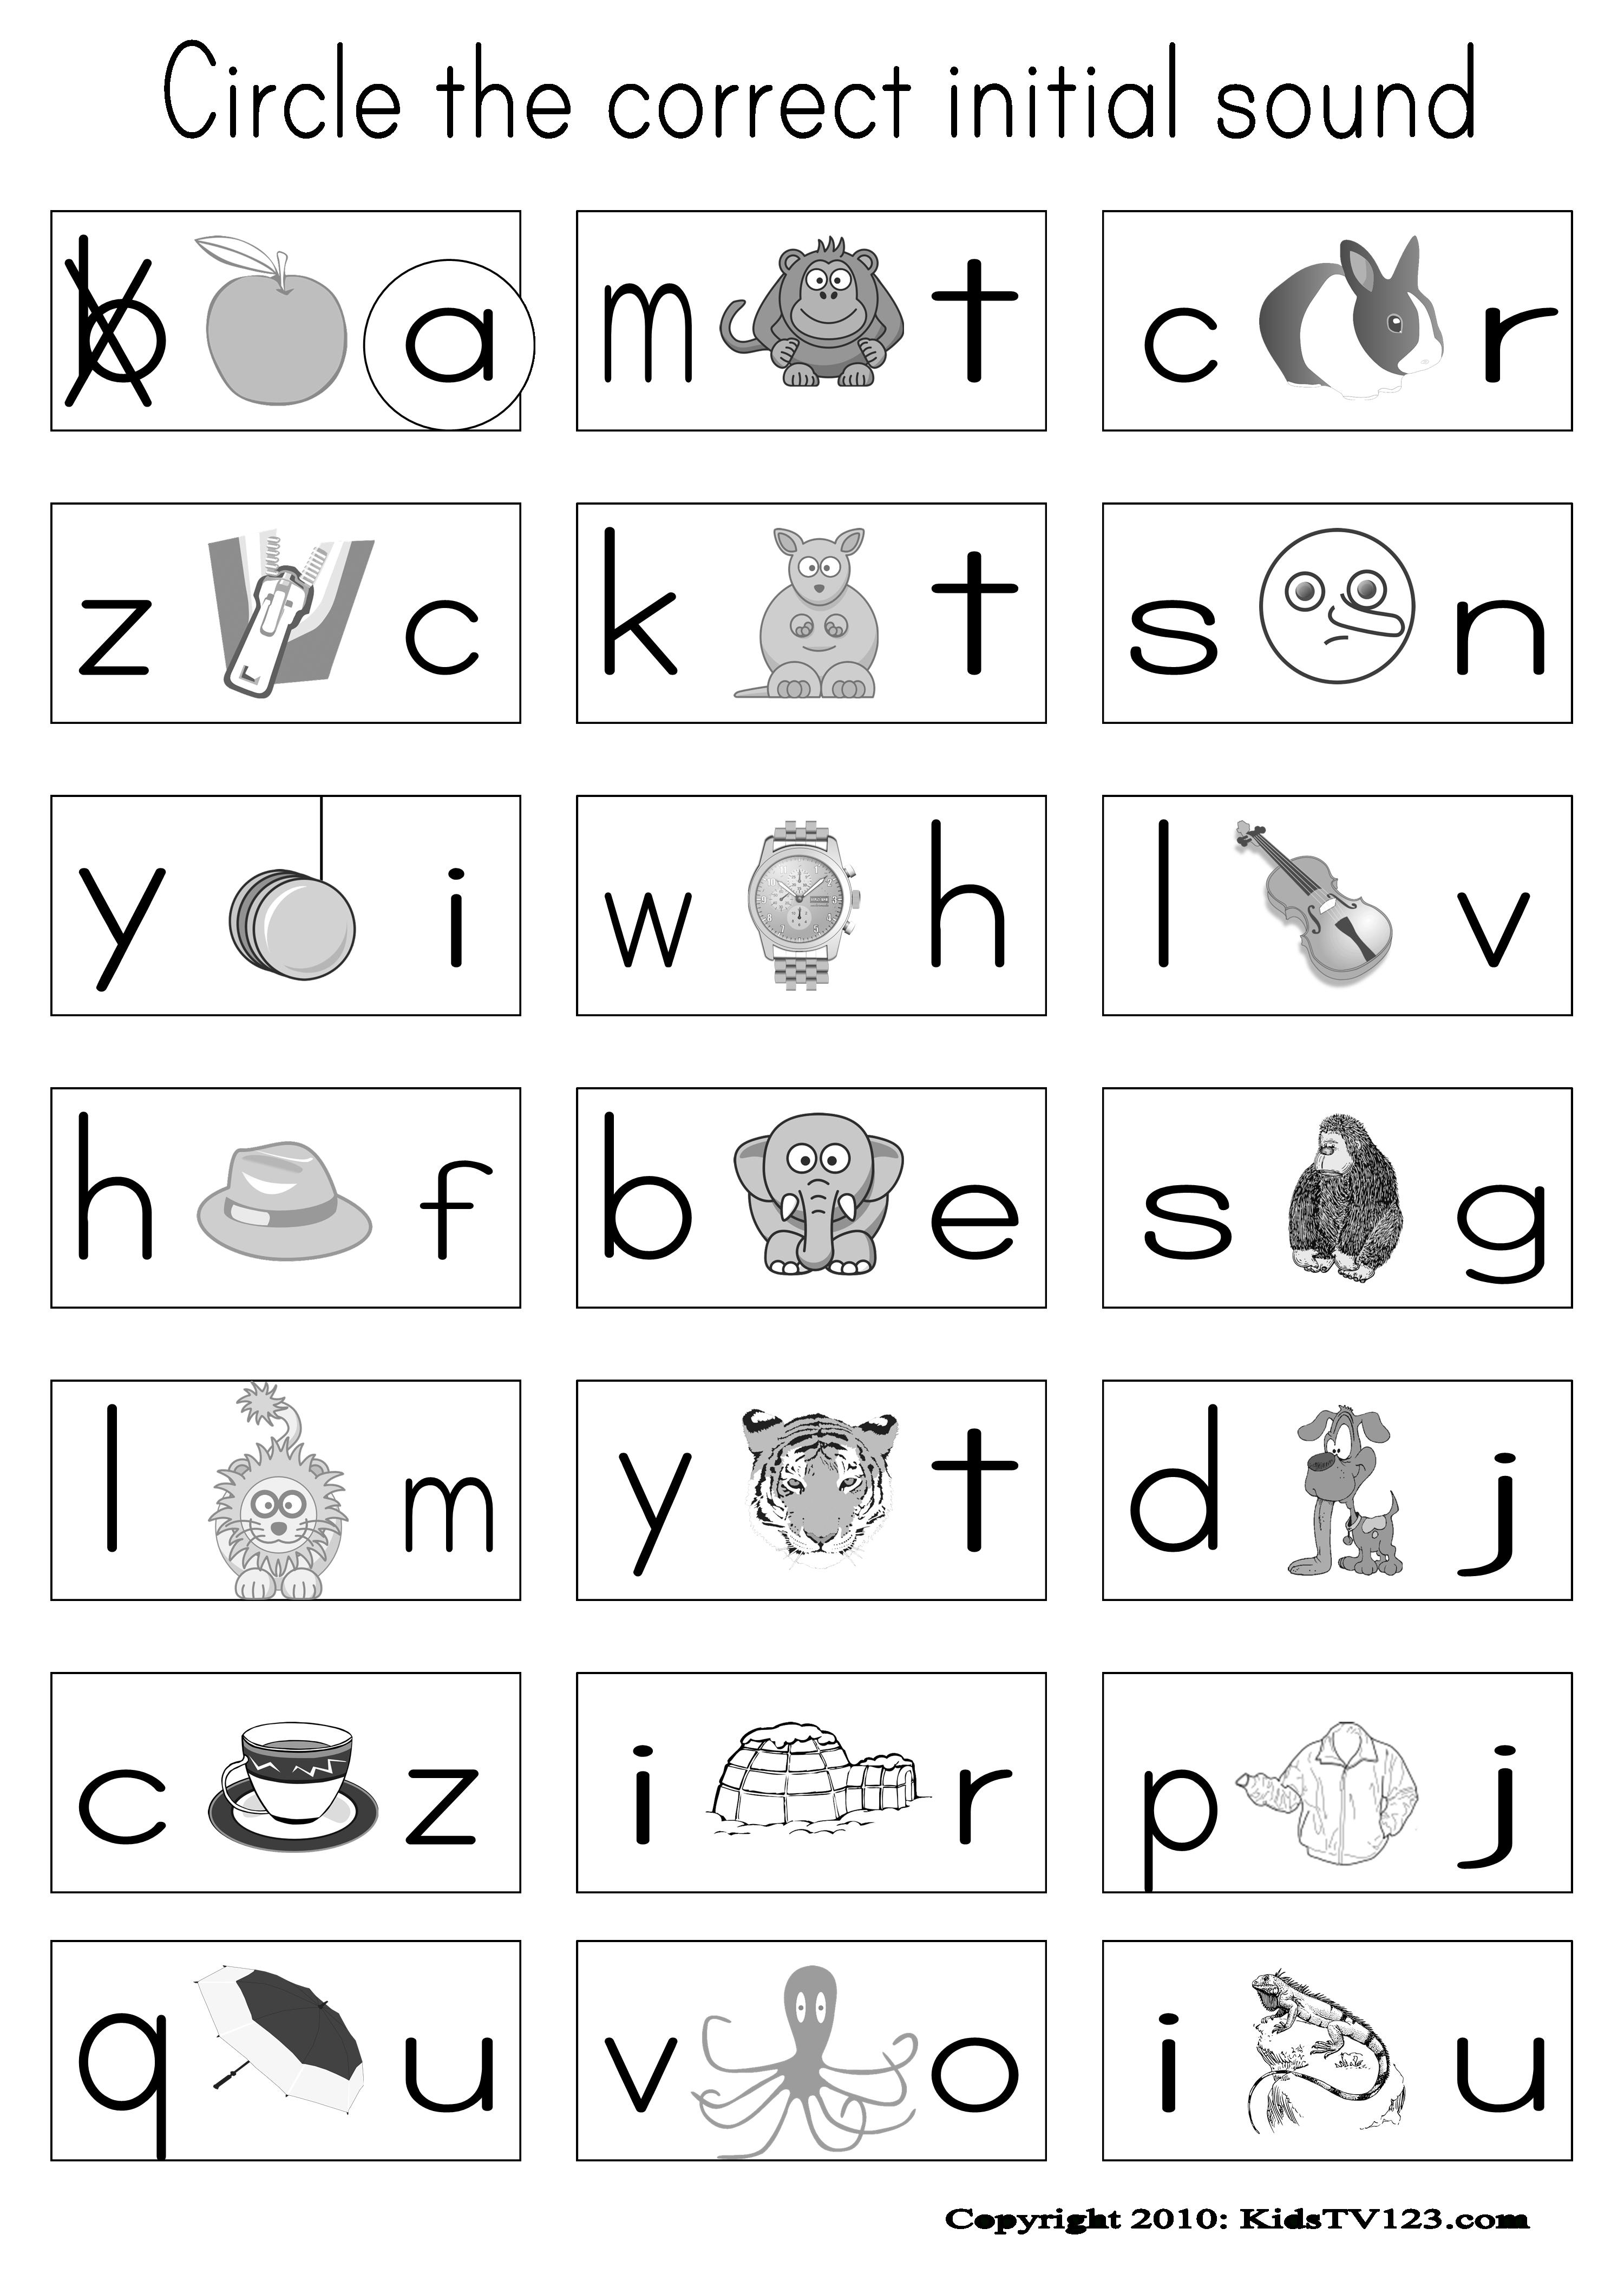 Kidstv123 - Phonics Worksheets | Phonics Kindergarten pertaining to Alphabet Sounds Worksheets For Kindergarten